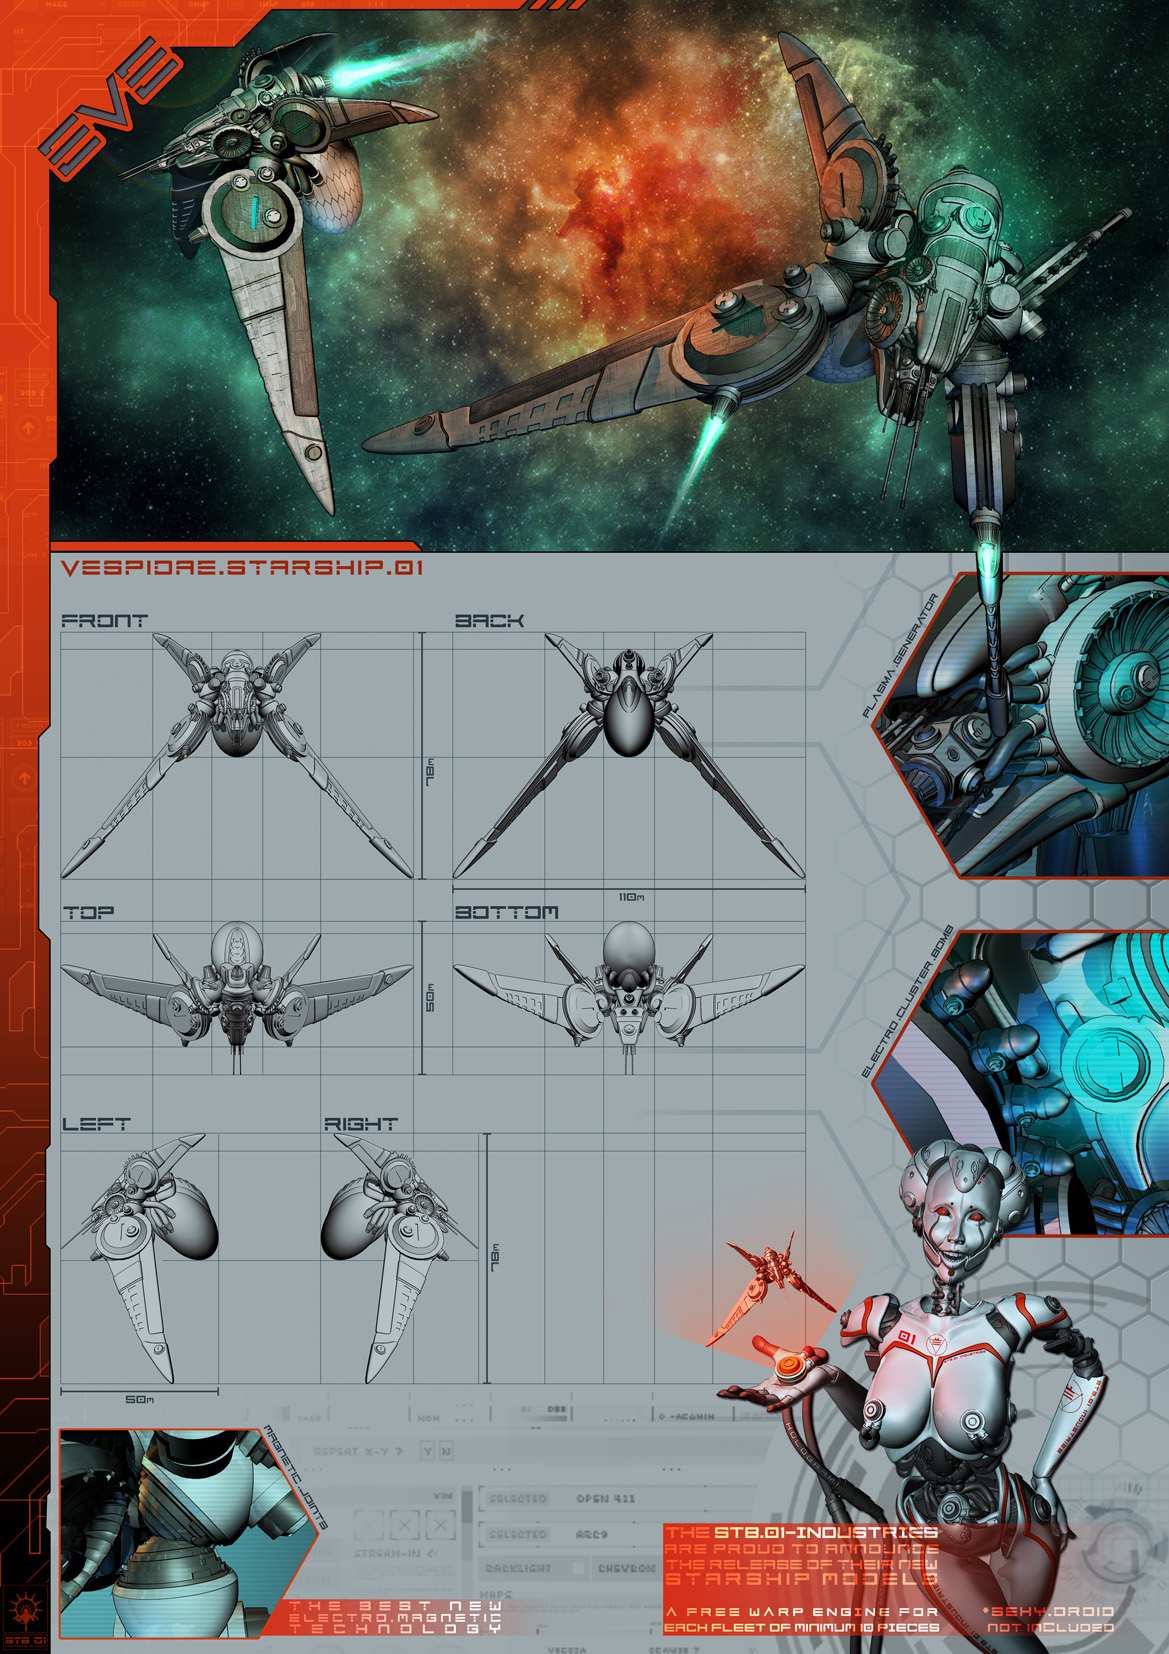 EVE: Vespidae Starship by FabioListrani